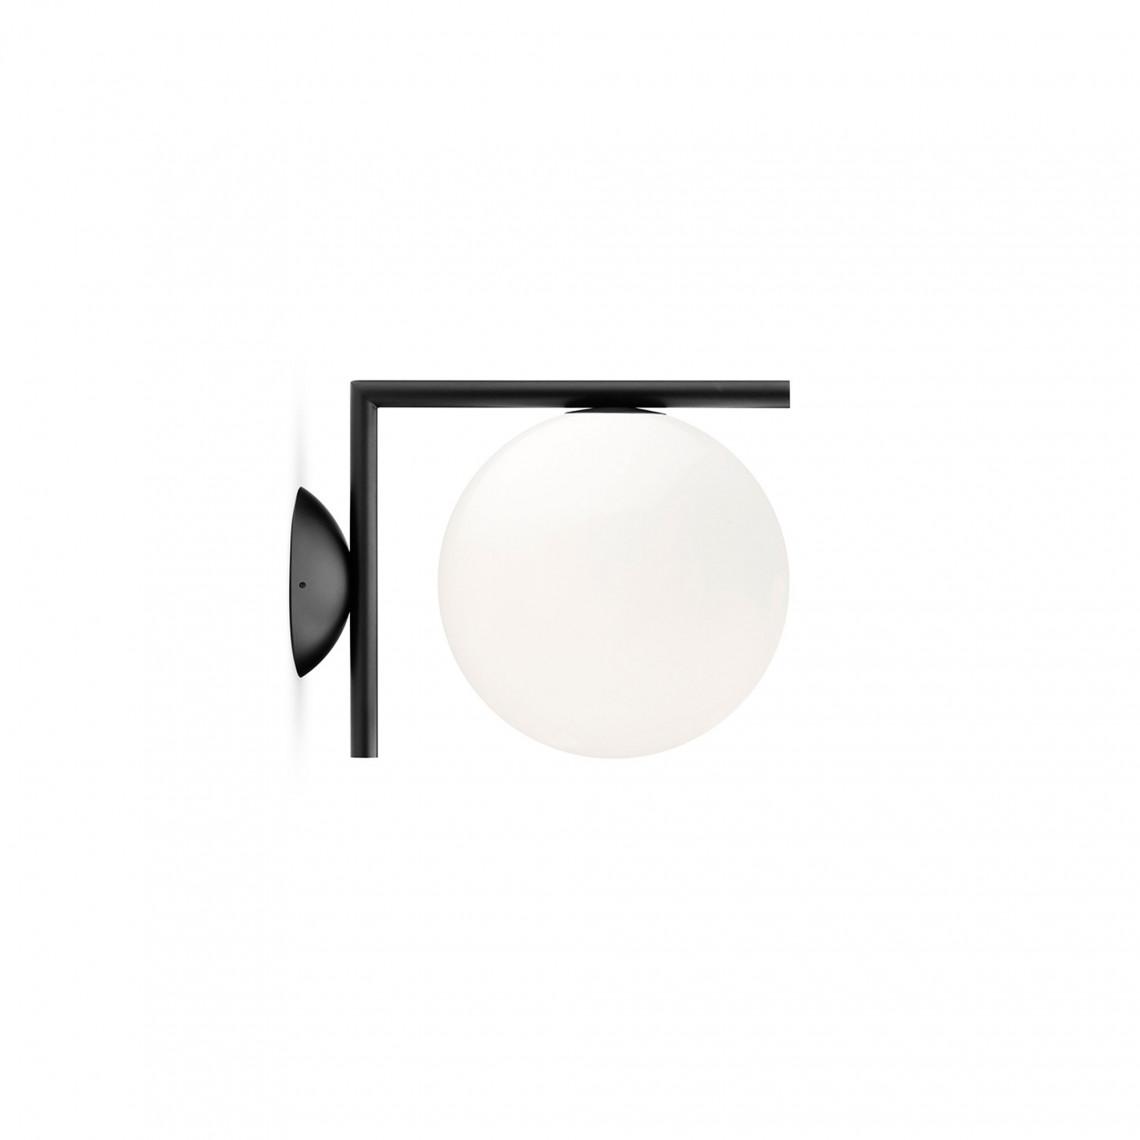 IC Lights Ceiling/Wall 1 Svart